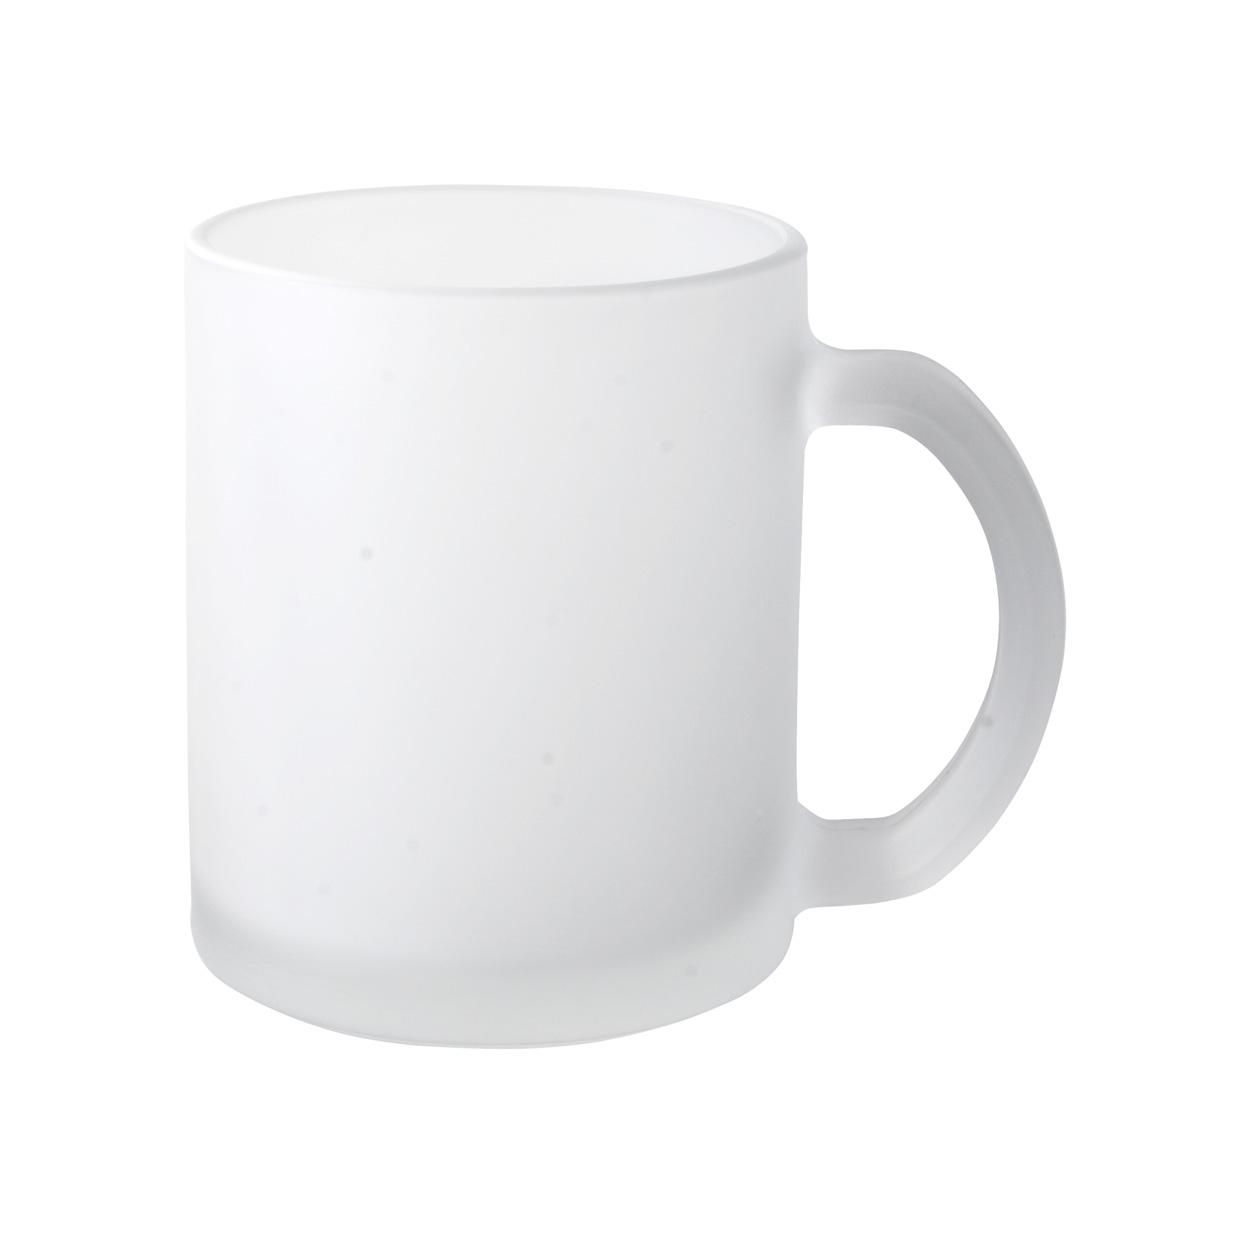 Forsa mug